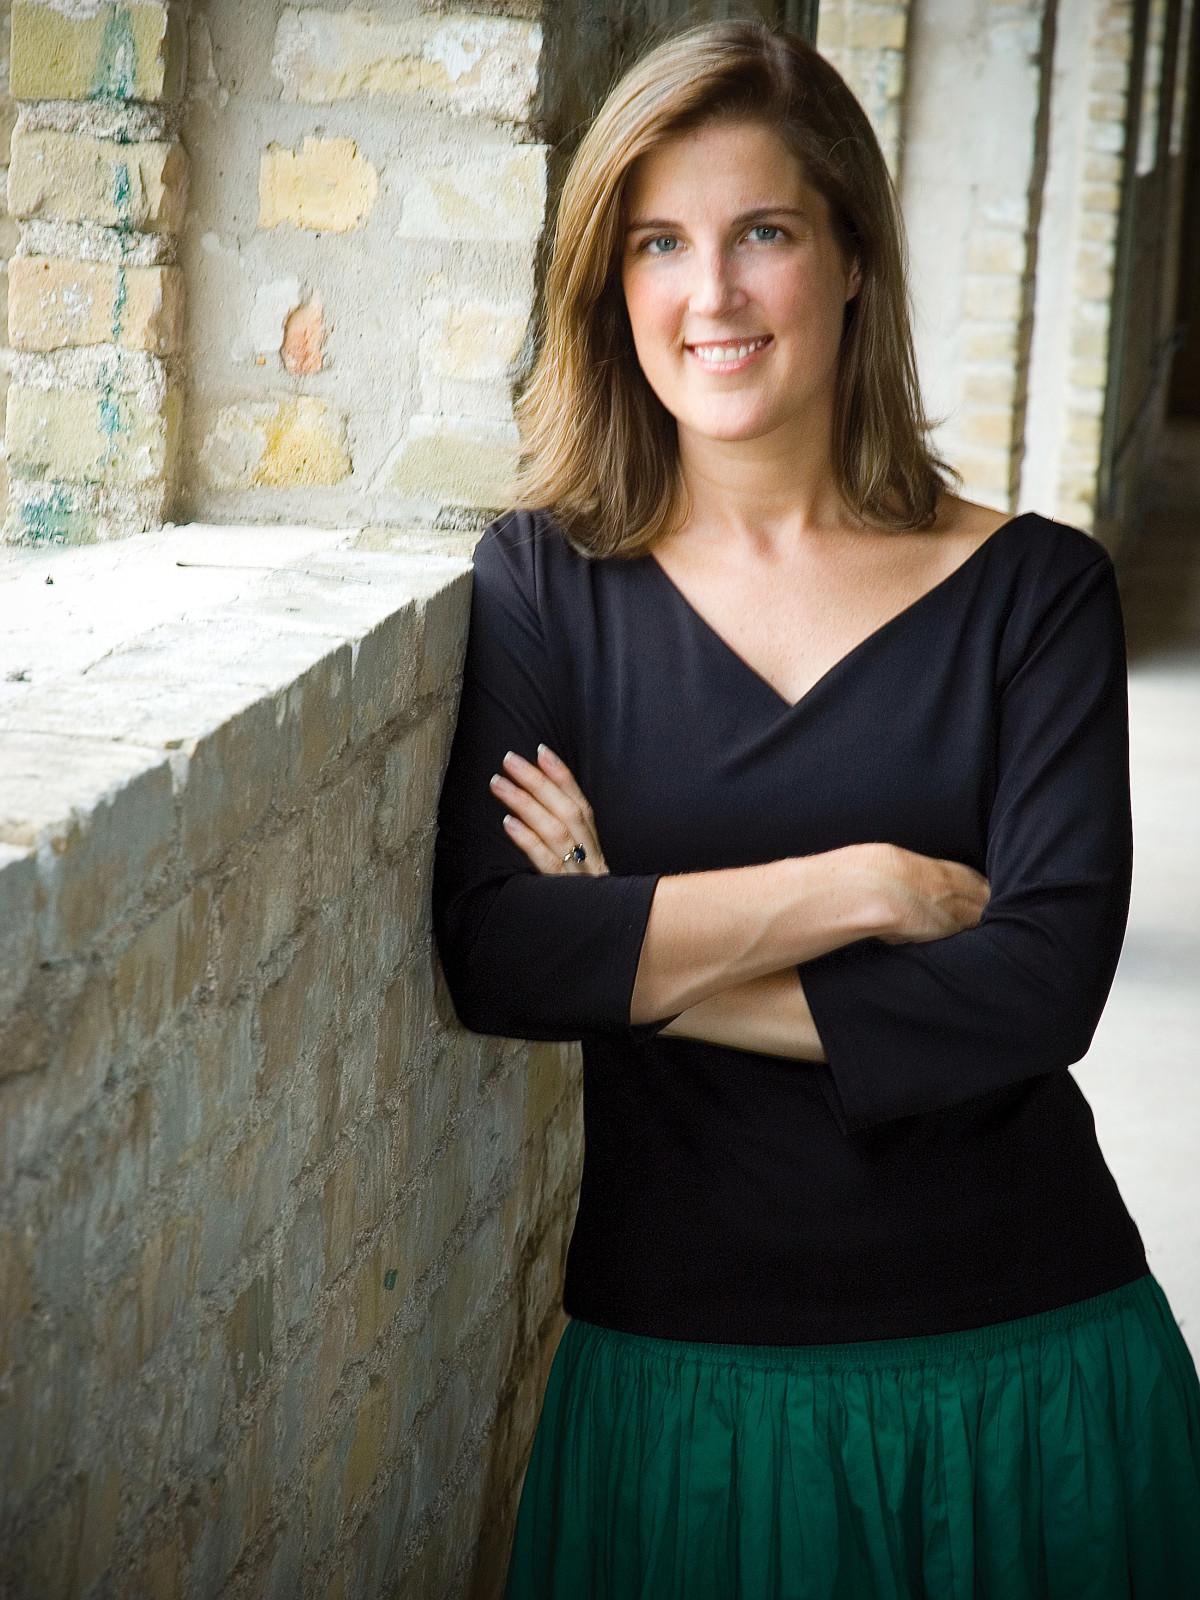 Austin_photo_Set: Literature_Sam_Amanda Eyre Ward_promo photo